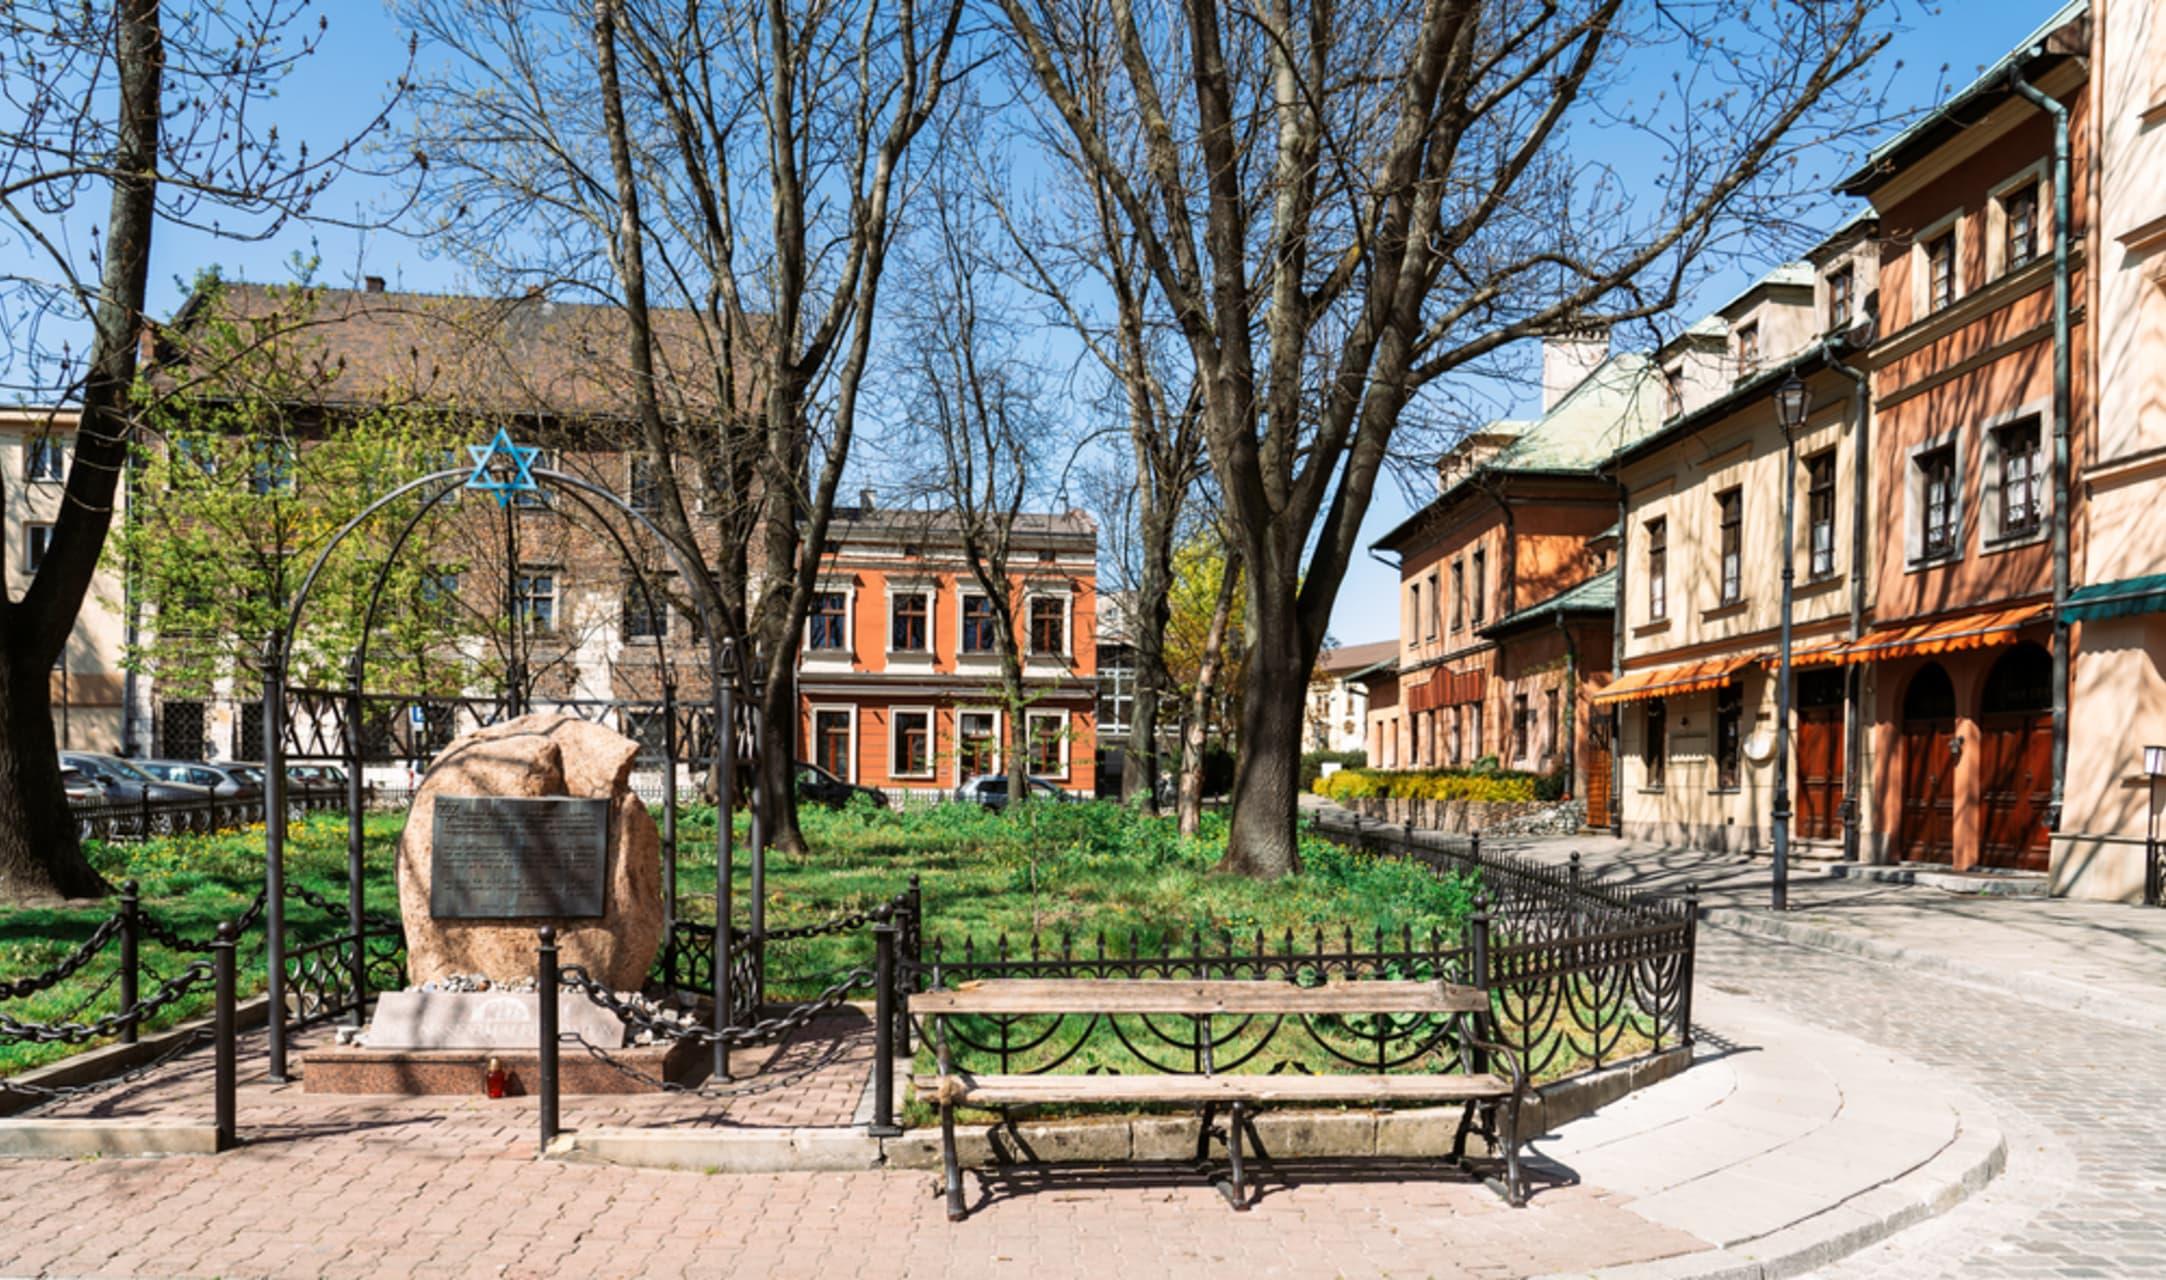 Krakow - Krakow famous Jewish Quarter - artistic atmosphere & historical importance